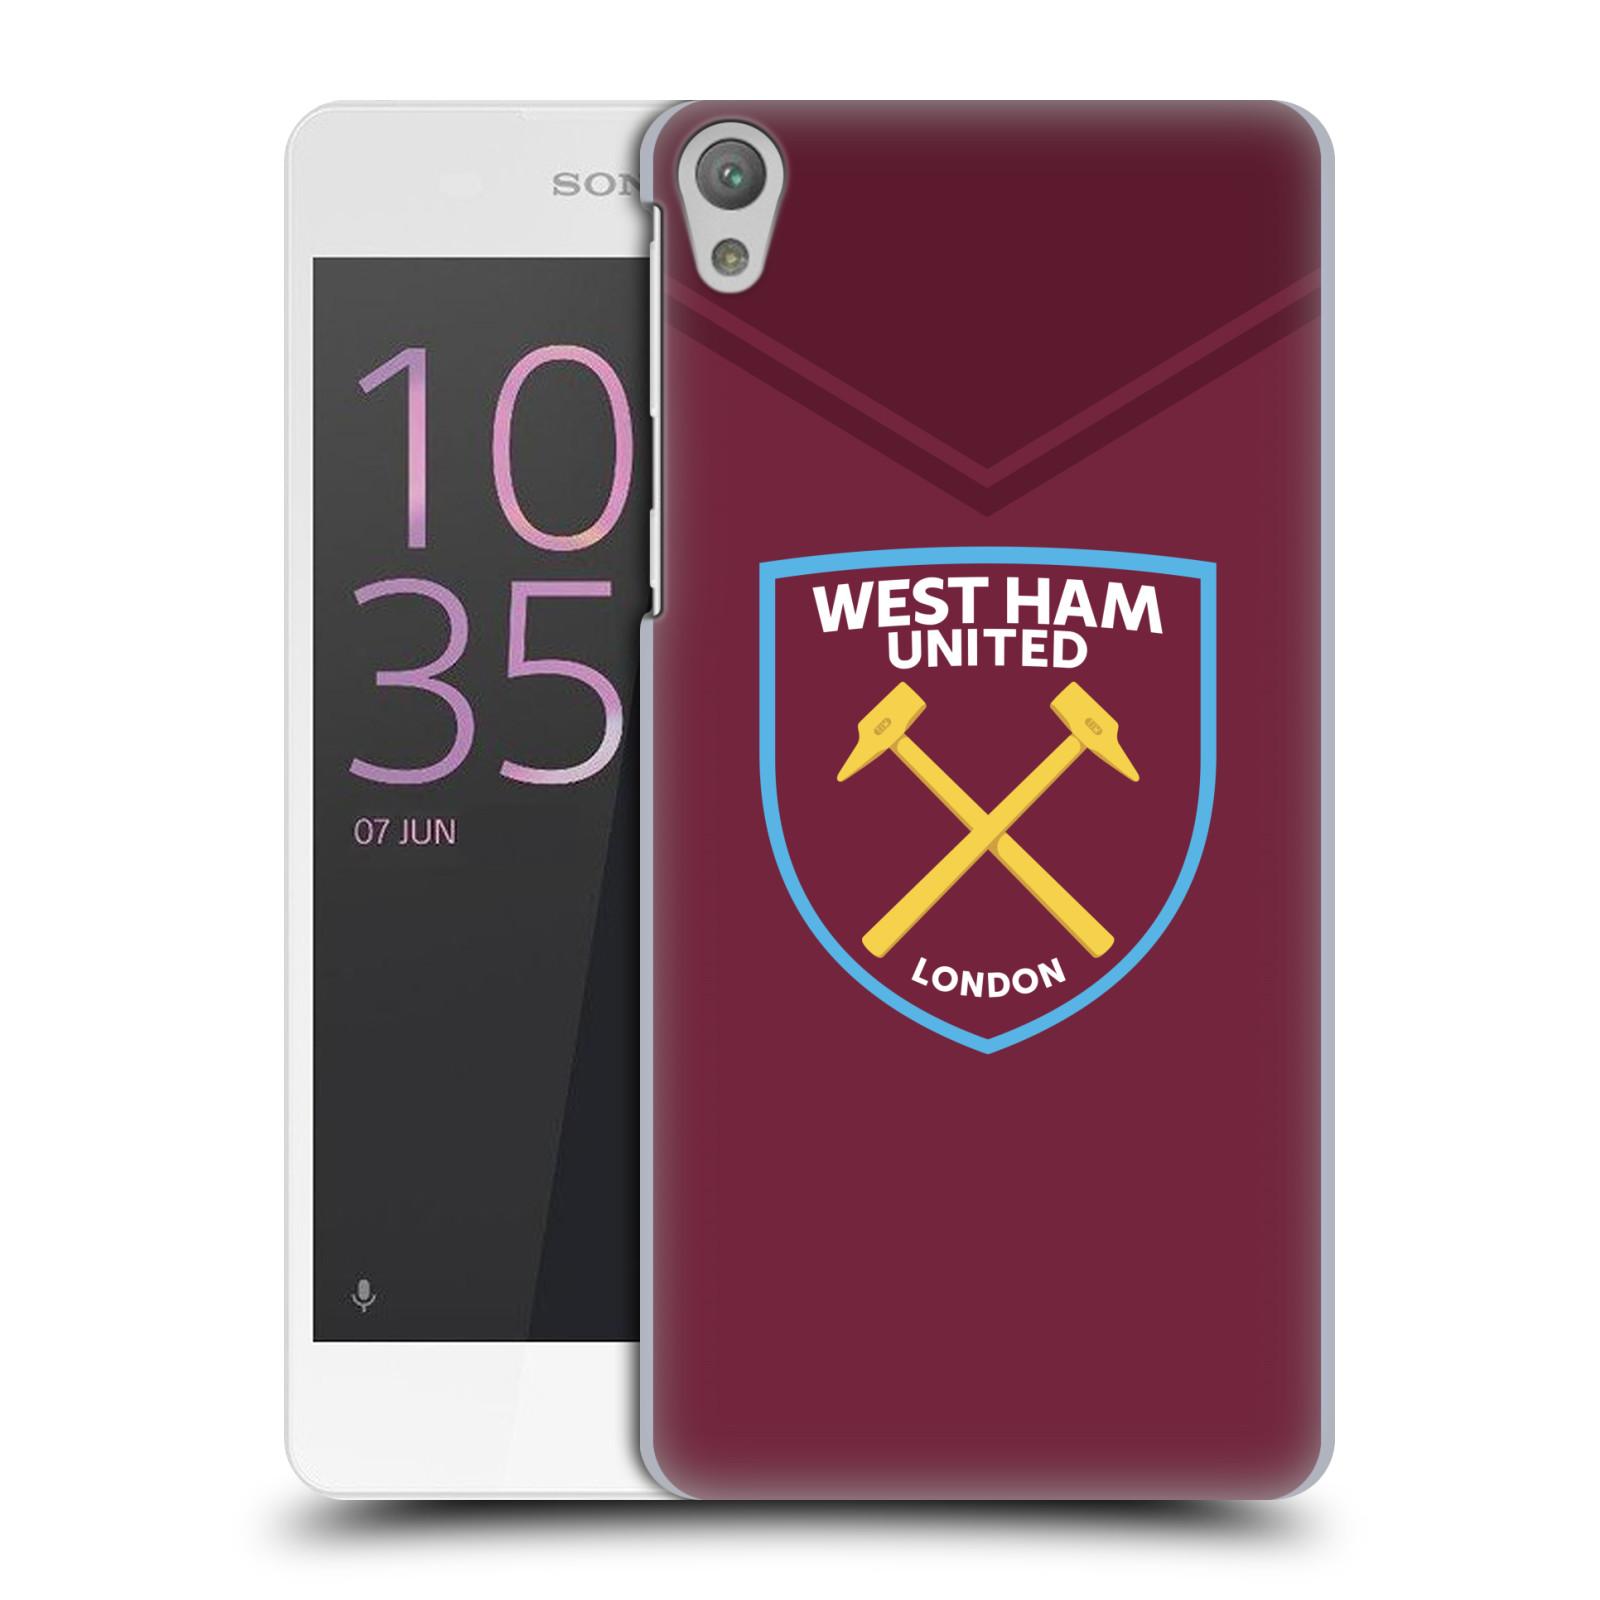 Plastové pouzdro na mobil Sony Xperia E5 - Head Case - West Ham United - Logo